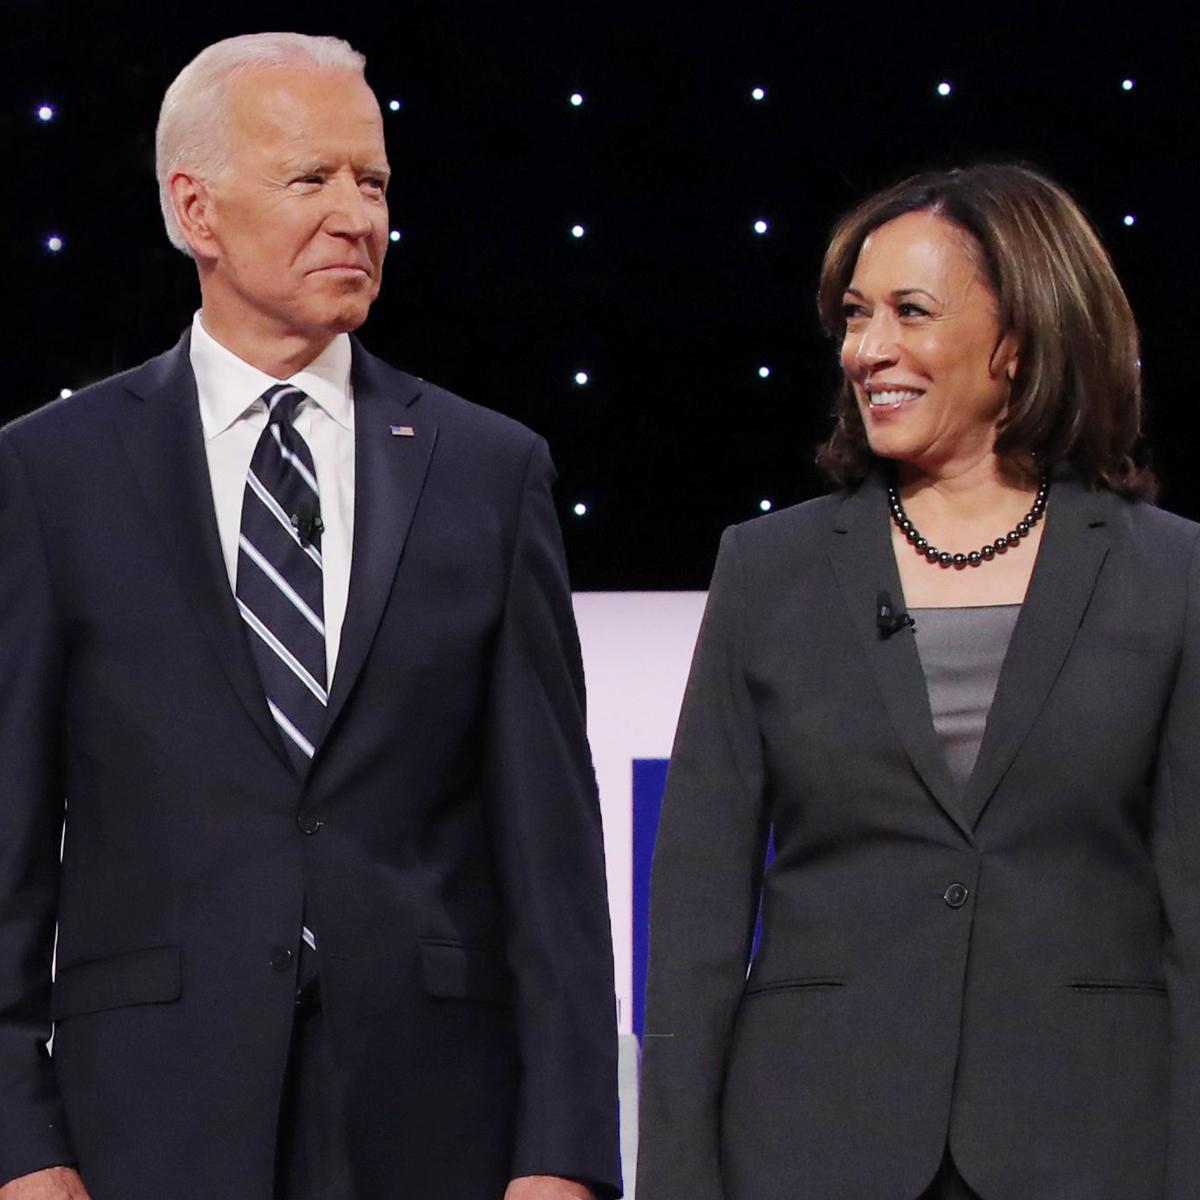 Joe Biden Selects Kamala Harris as His Vice Presidential Running Mate: Hollywood Reacts